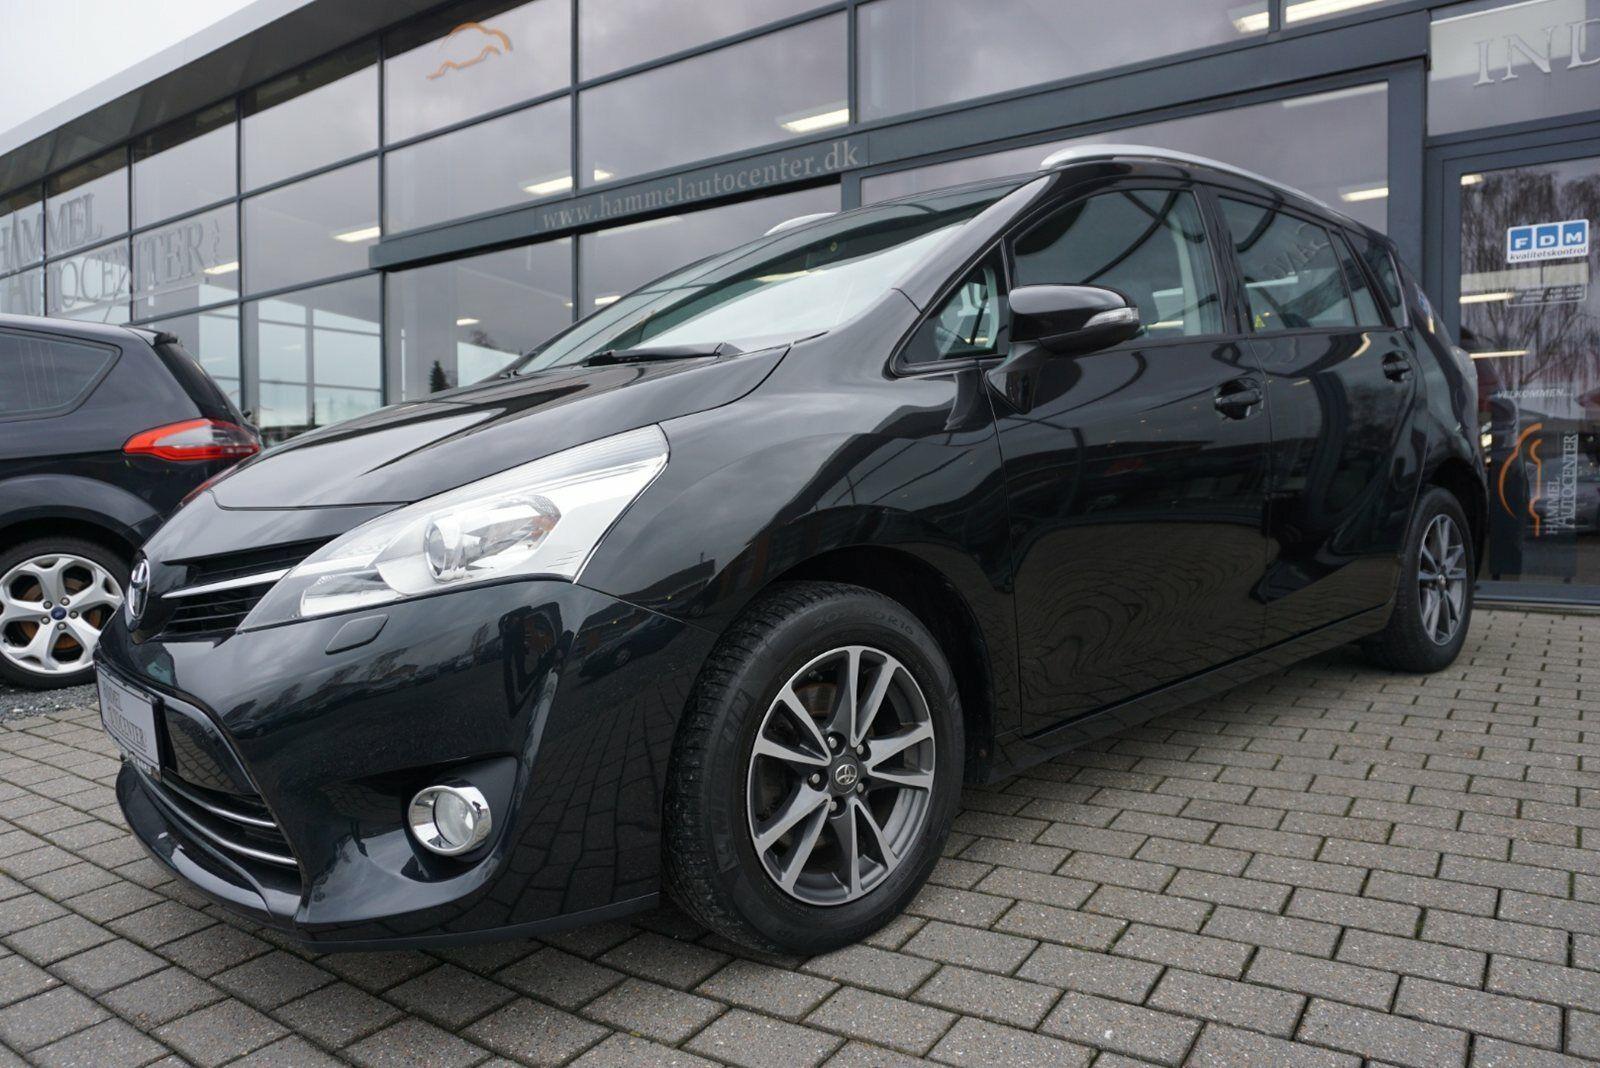 Toyota Verso 1,6 D-4D T2 Touch 7prs 5d - 159.800 kr.